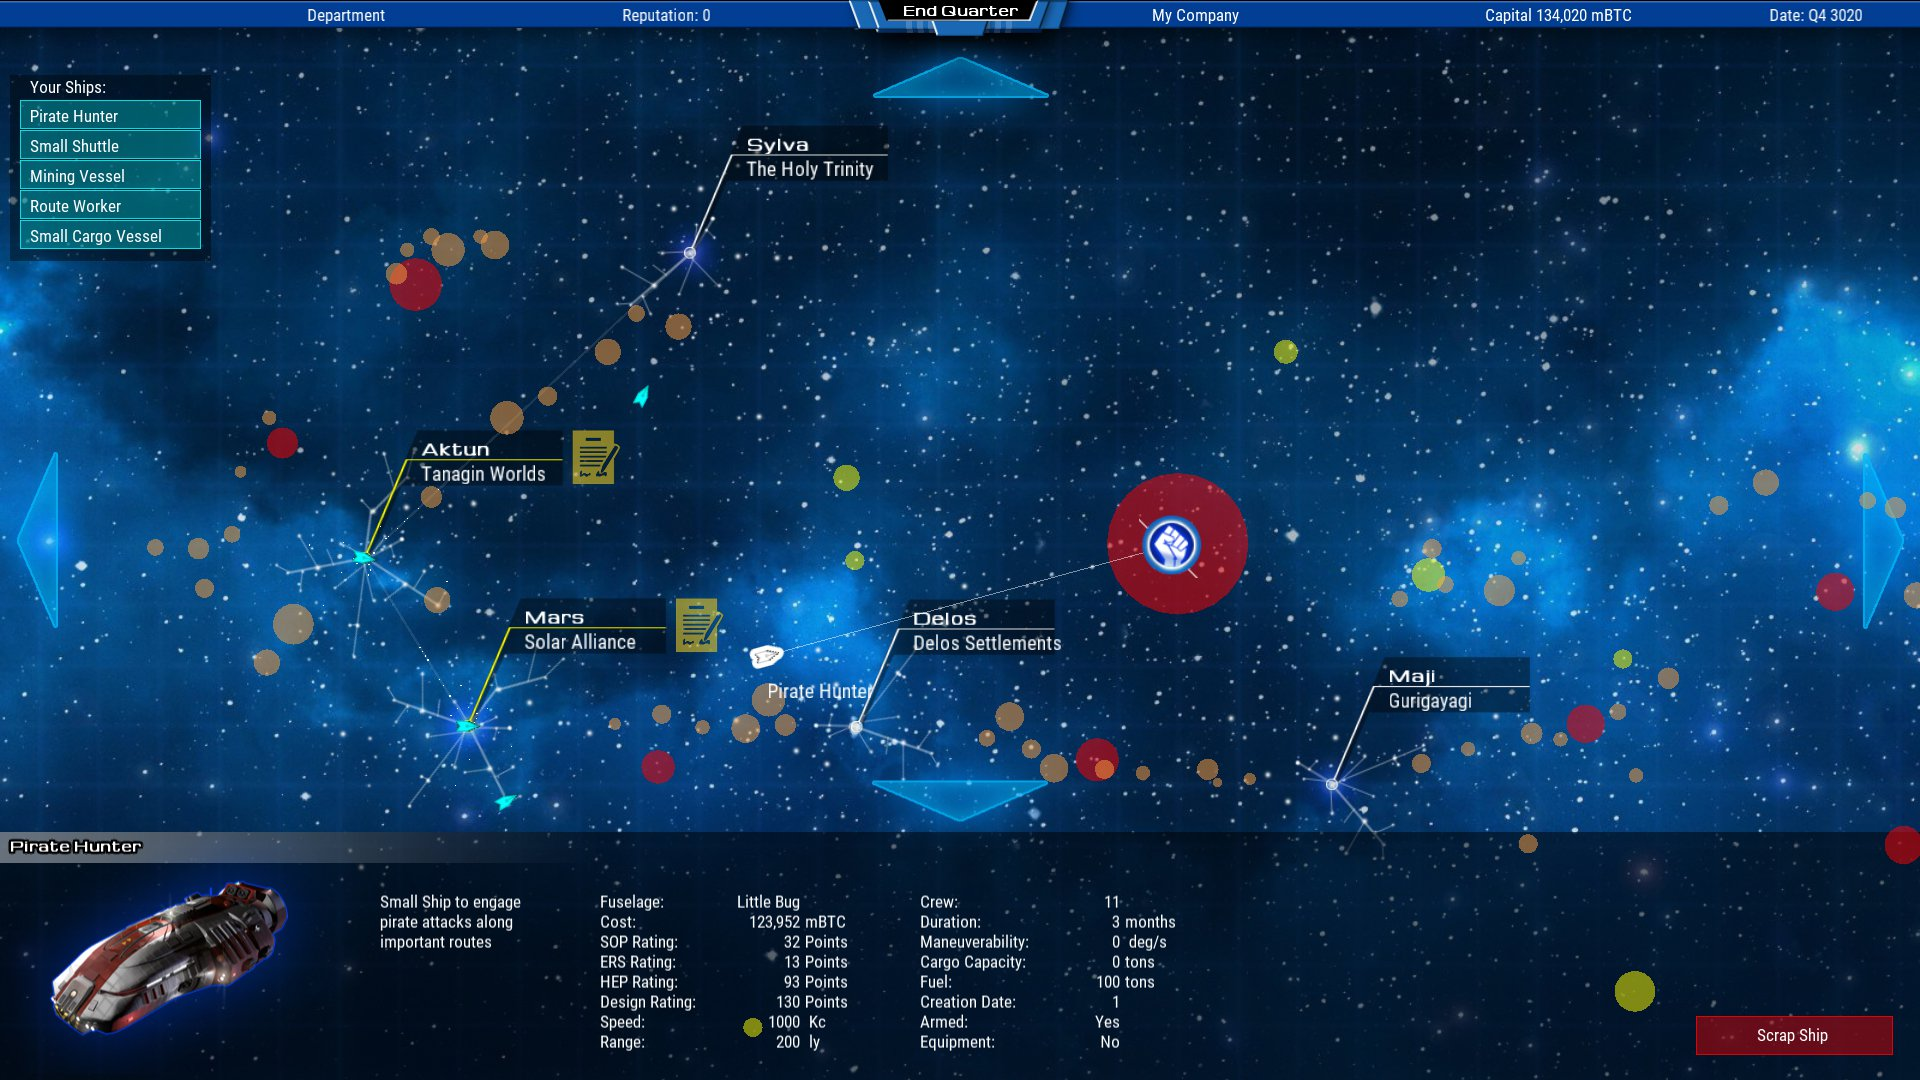 Starship Corporation 9